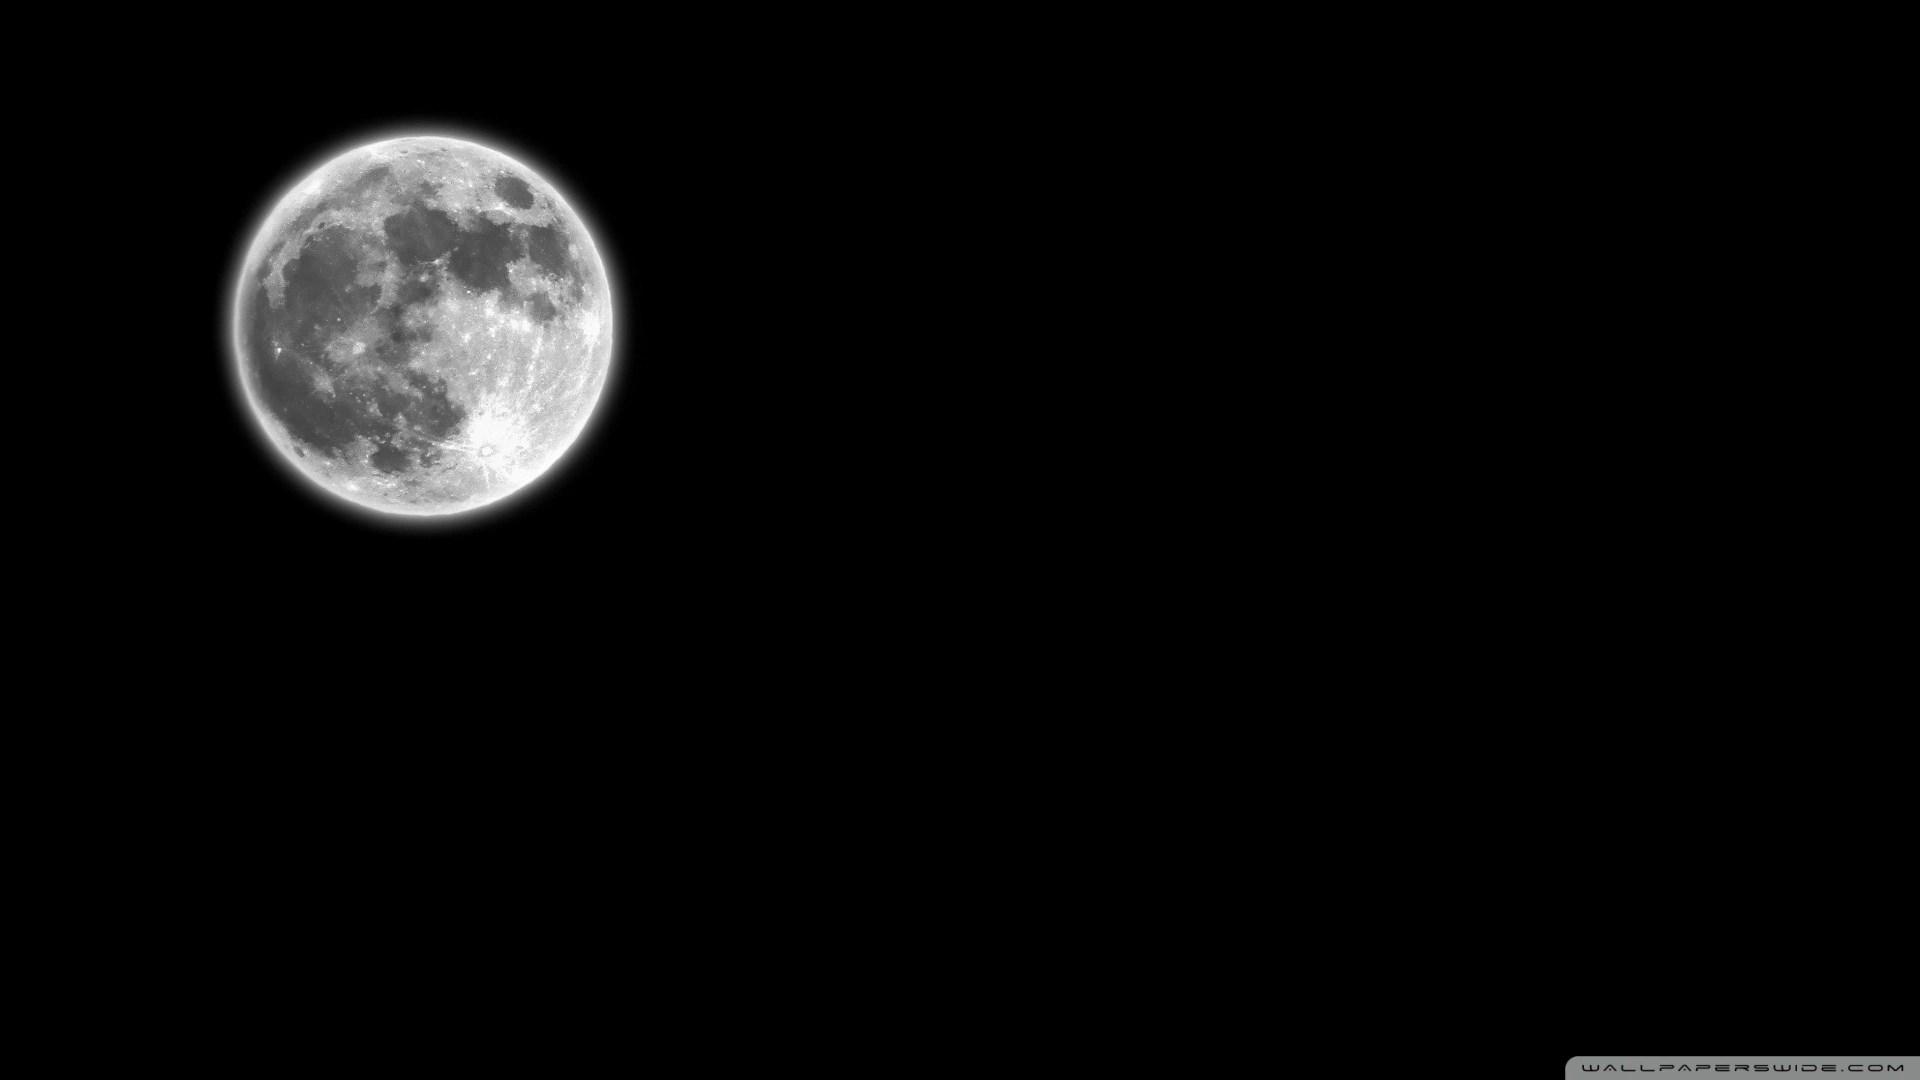 Black background moon